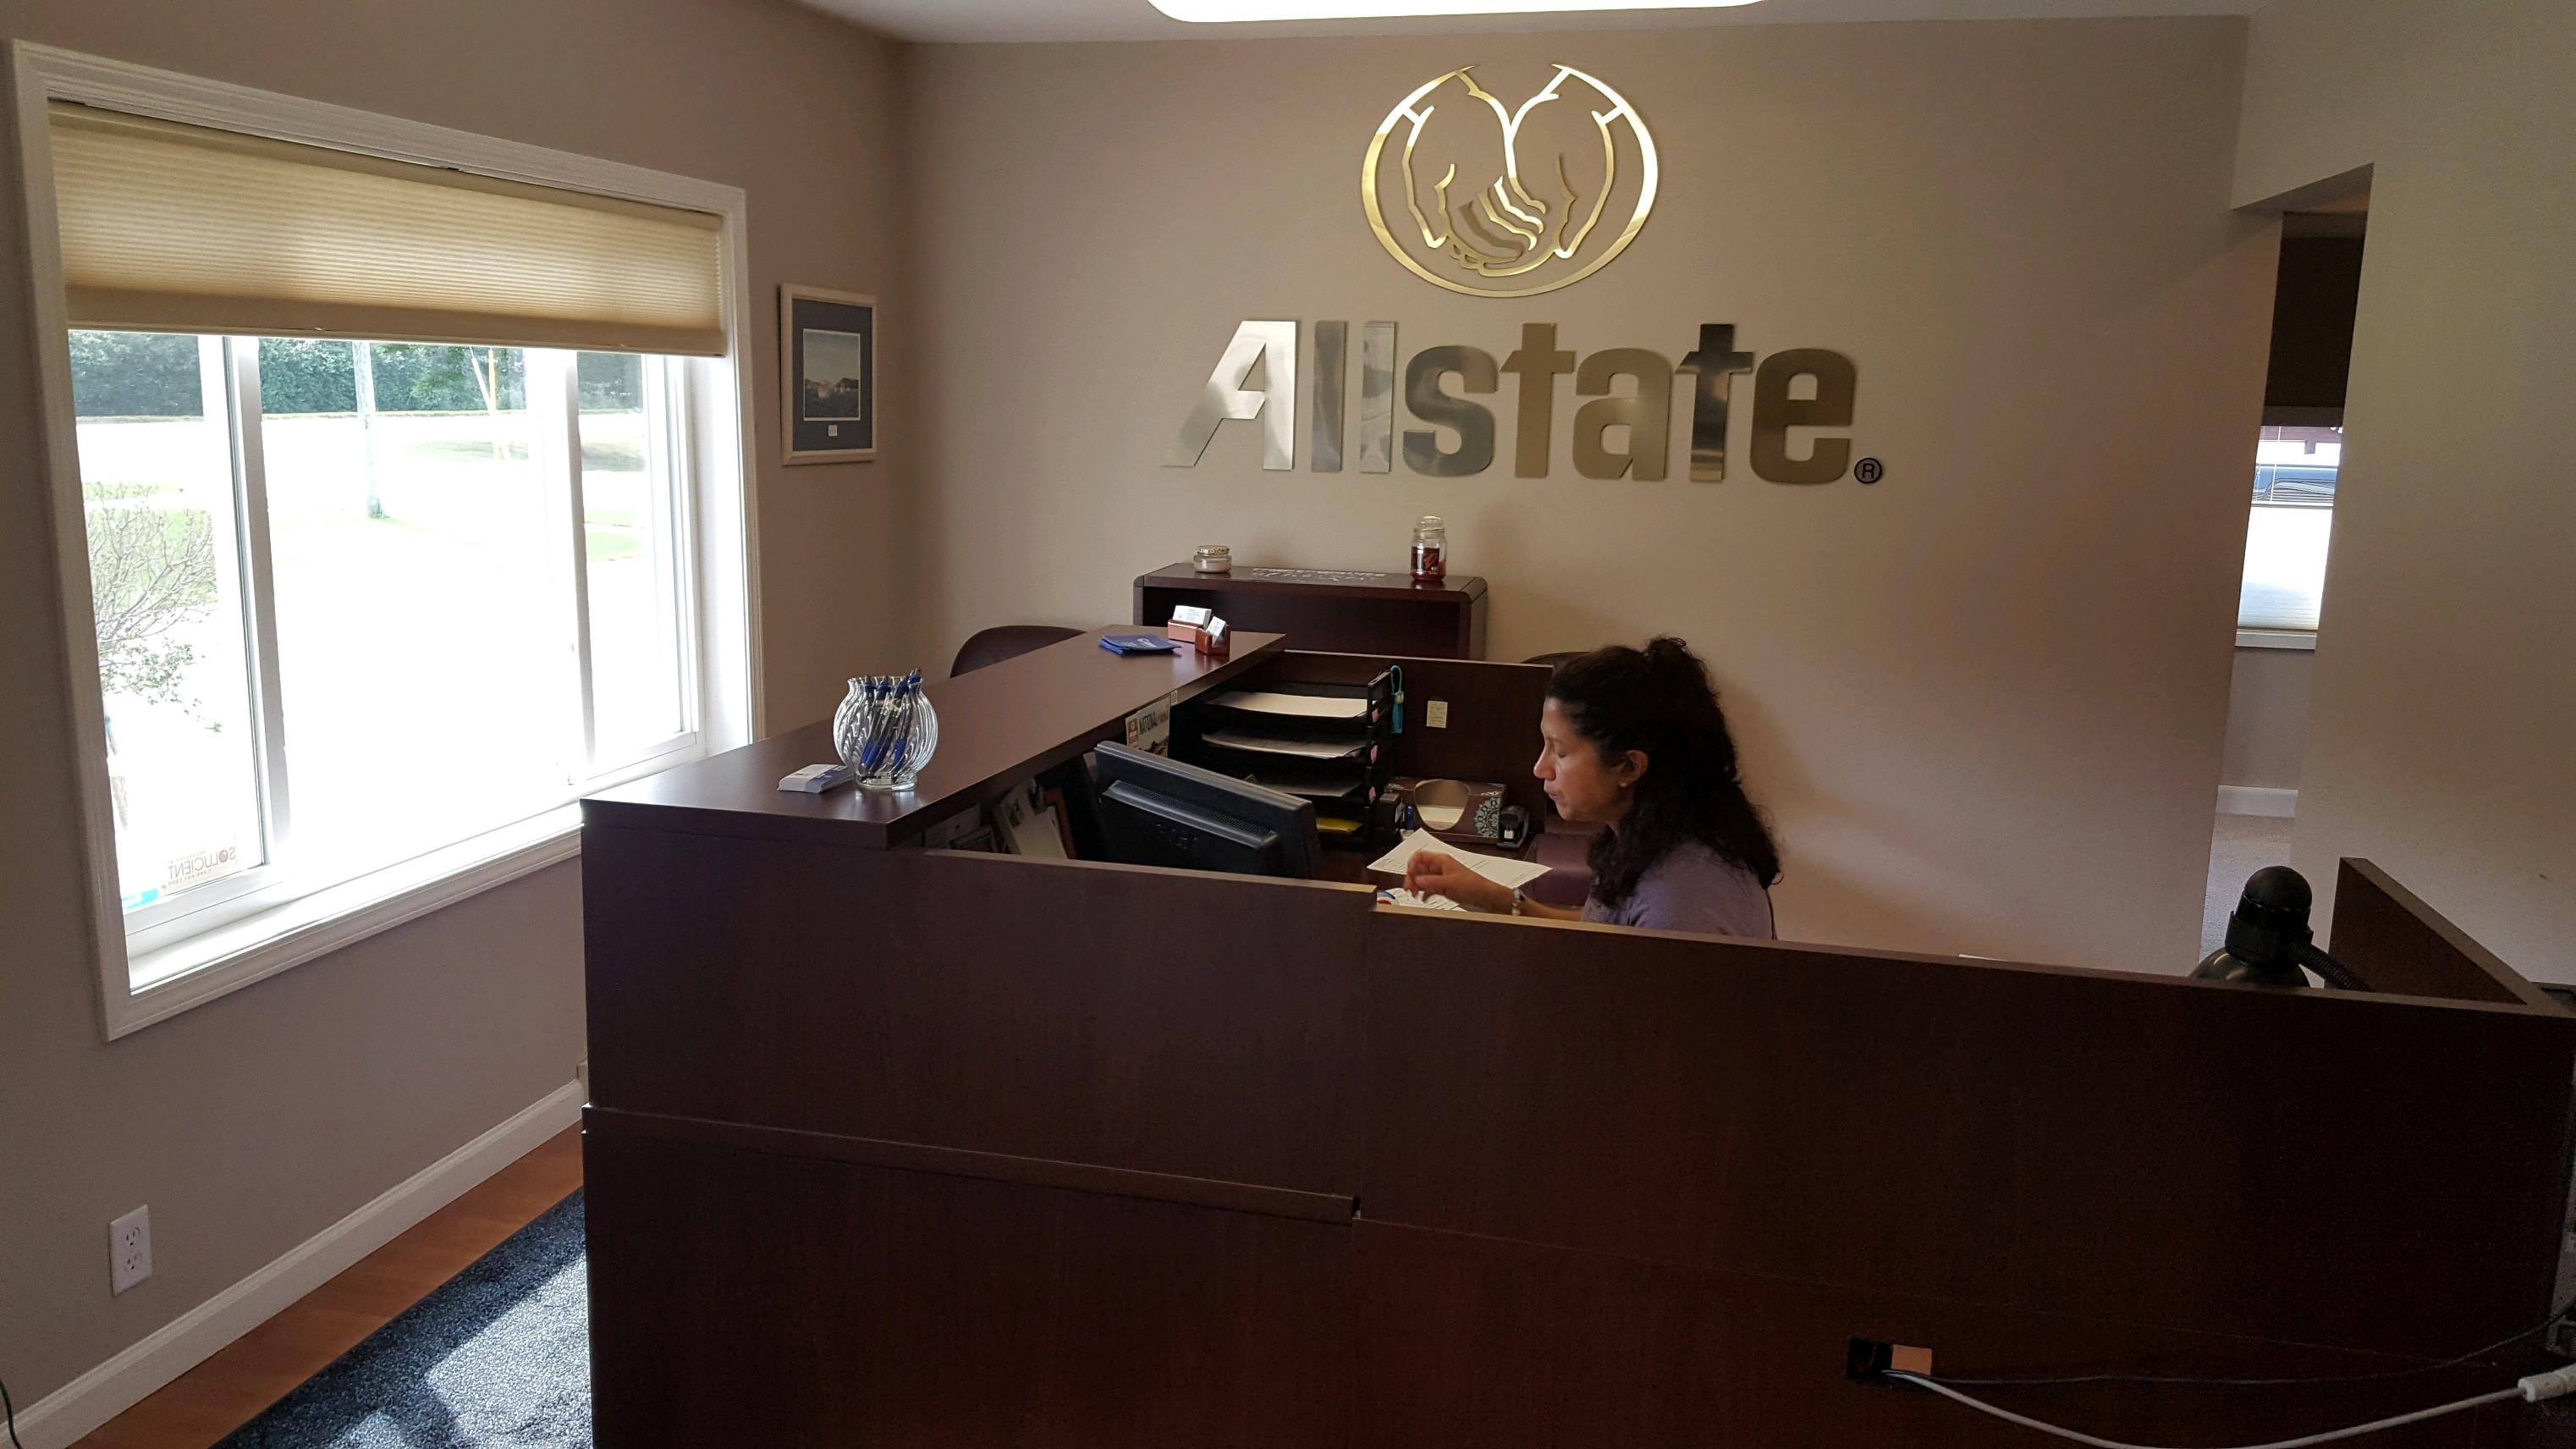 Patrick Carey: Allstate Insurance image 1